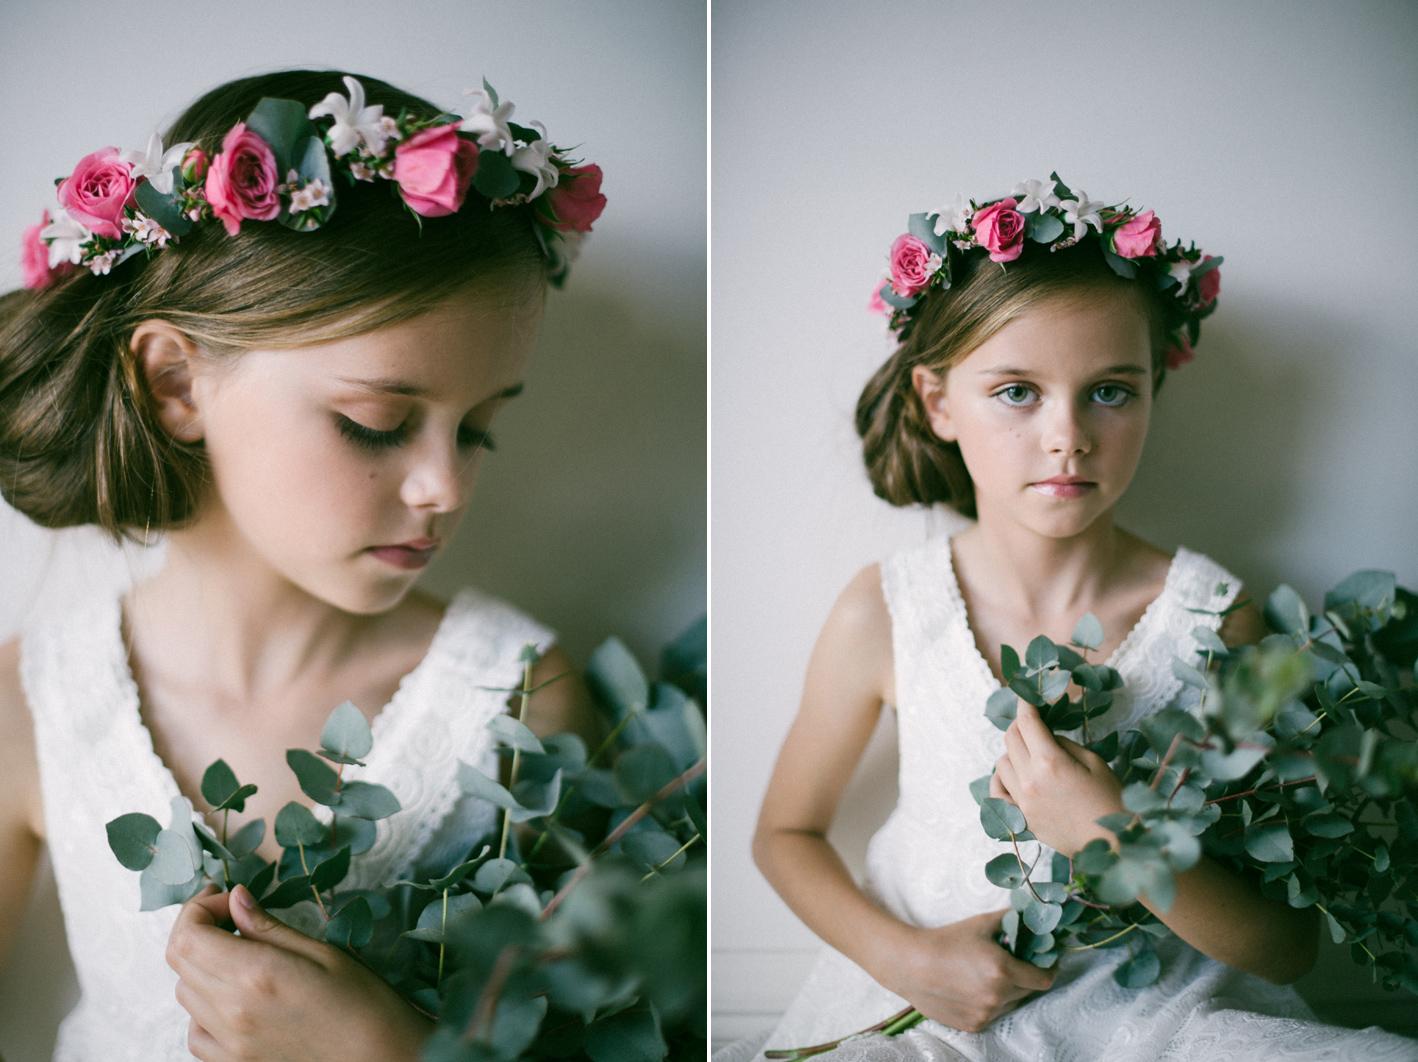 014-crown-of-eden-sophie-baker-photography